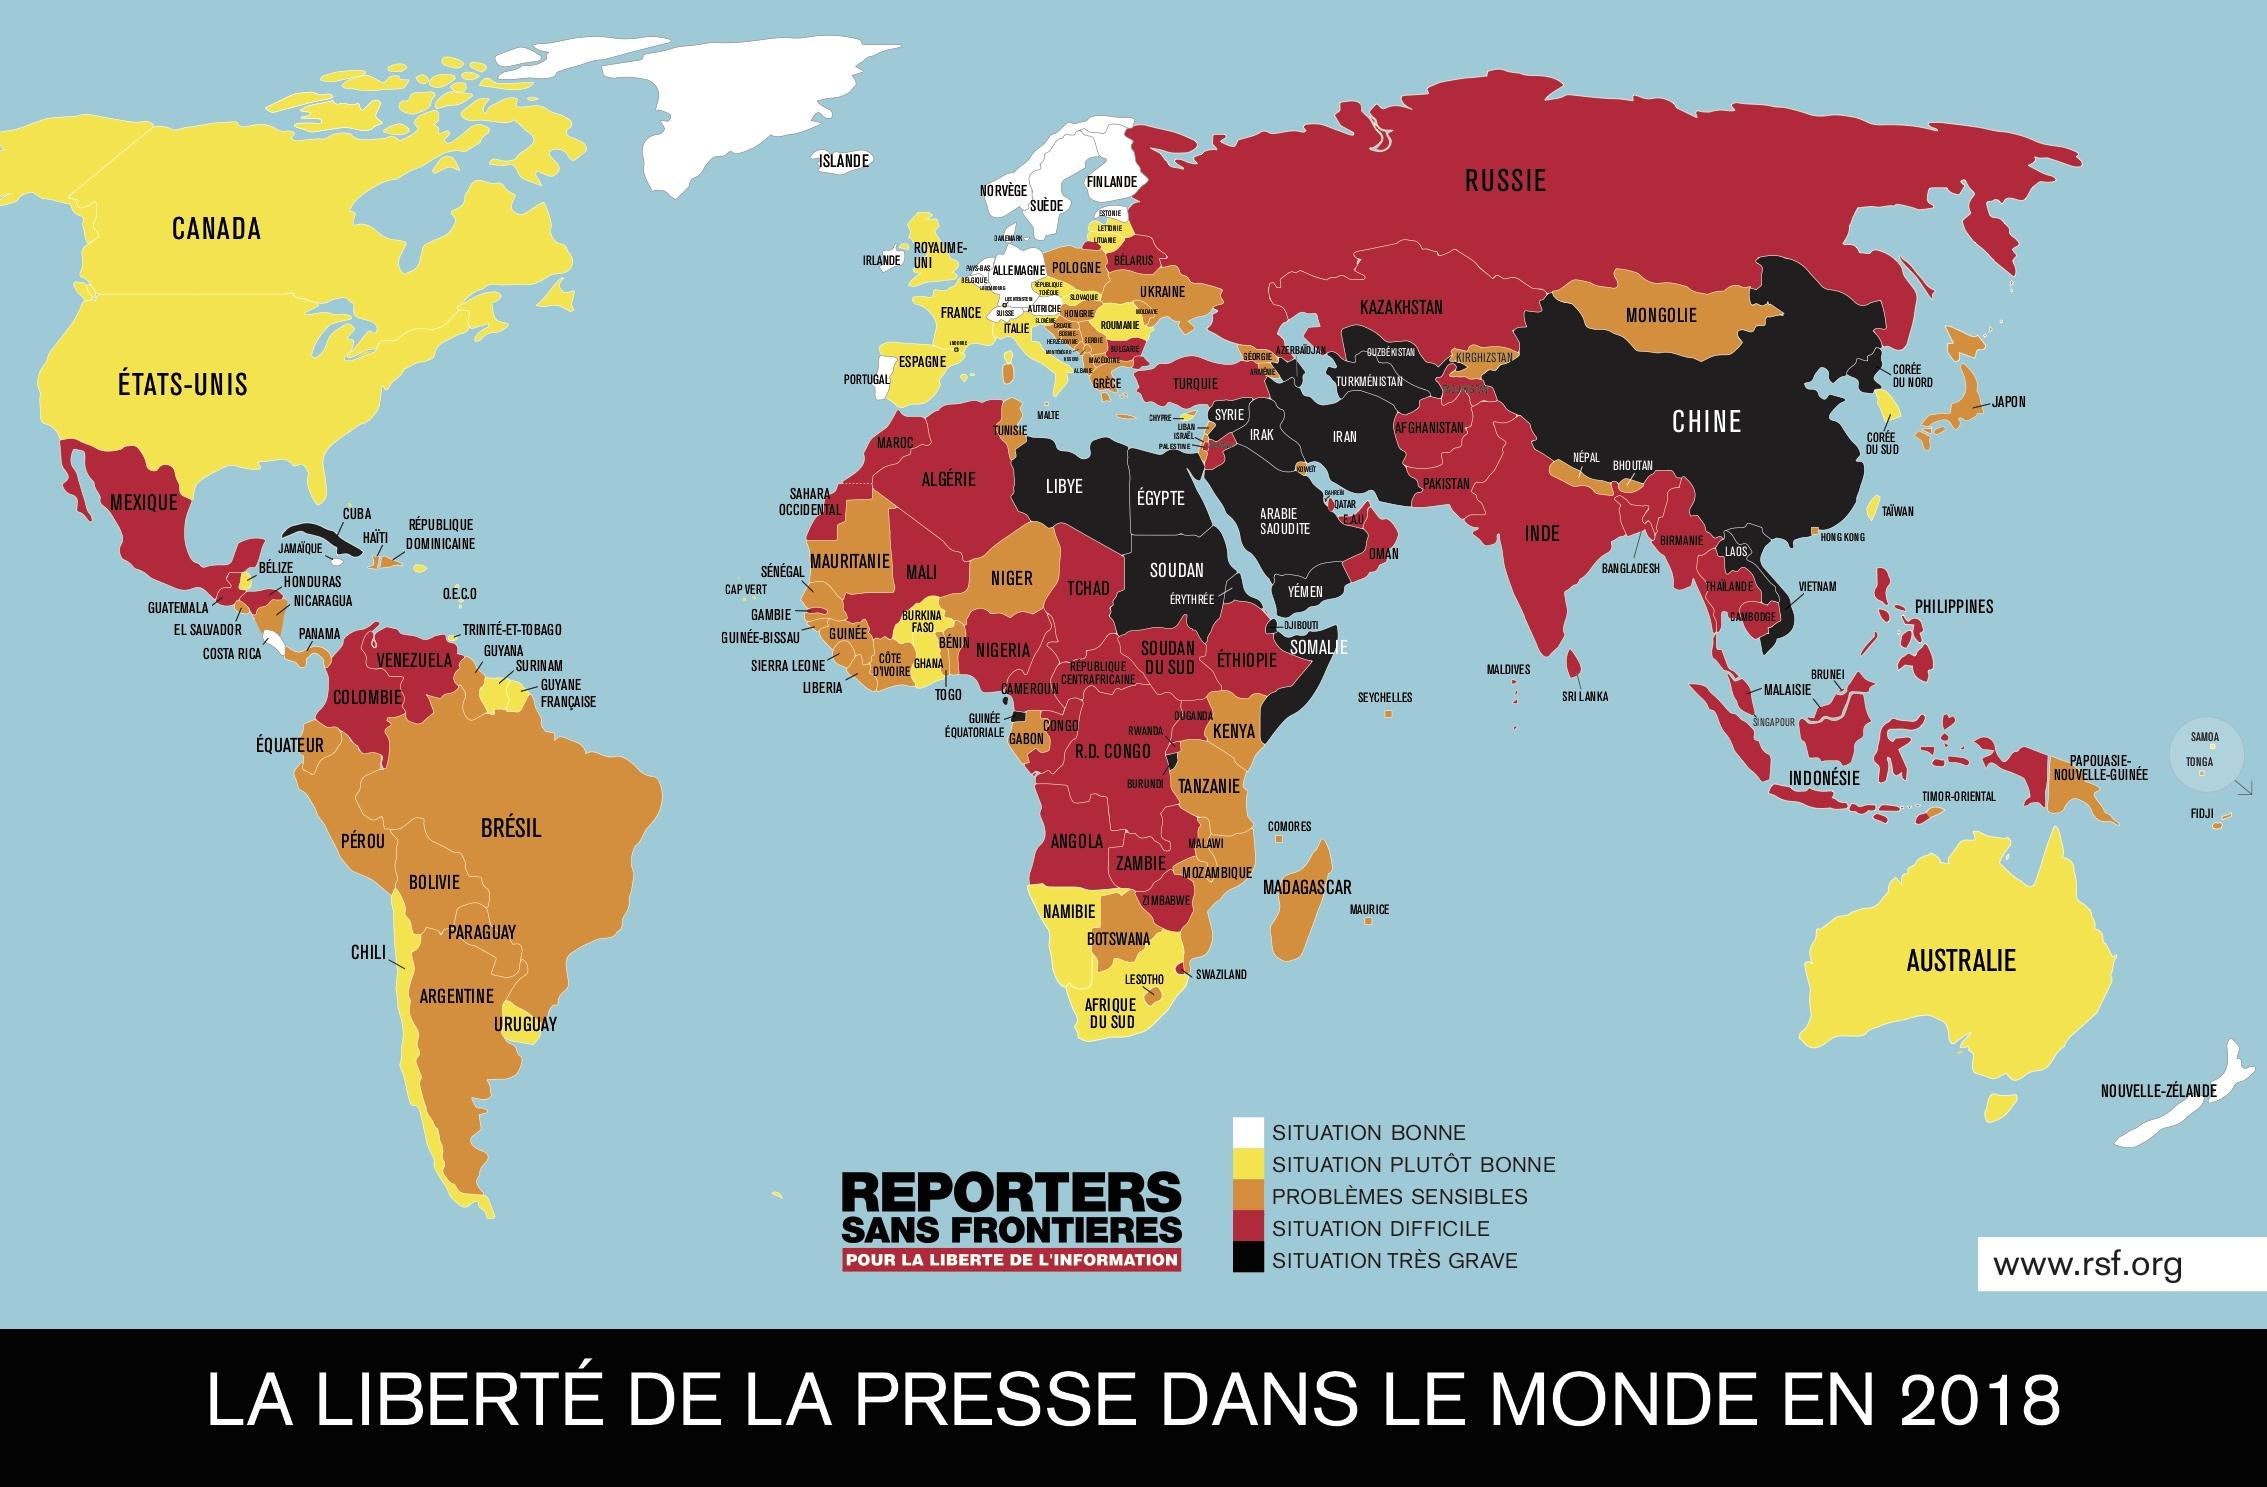 Monde - Liberté de la presse (2018)